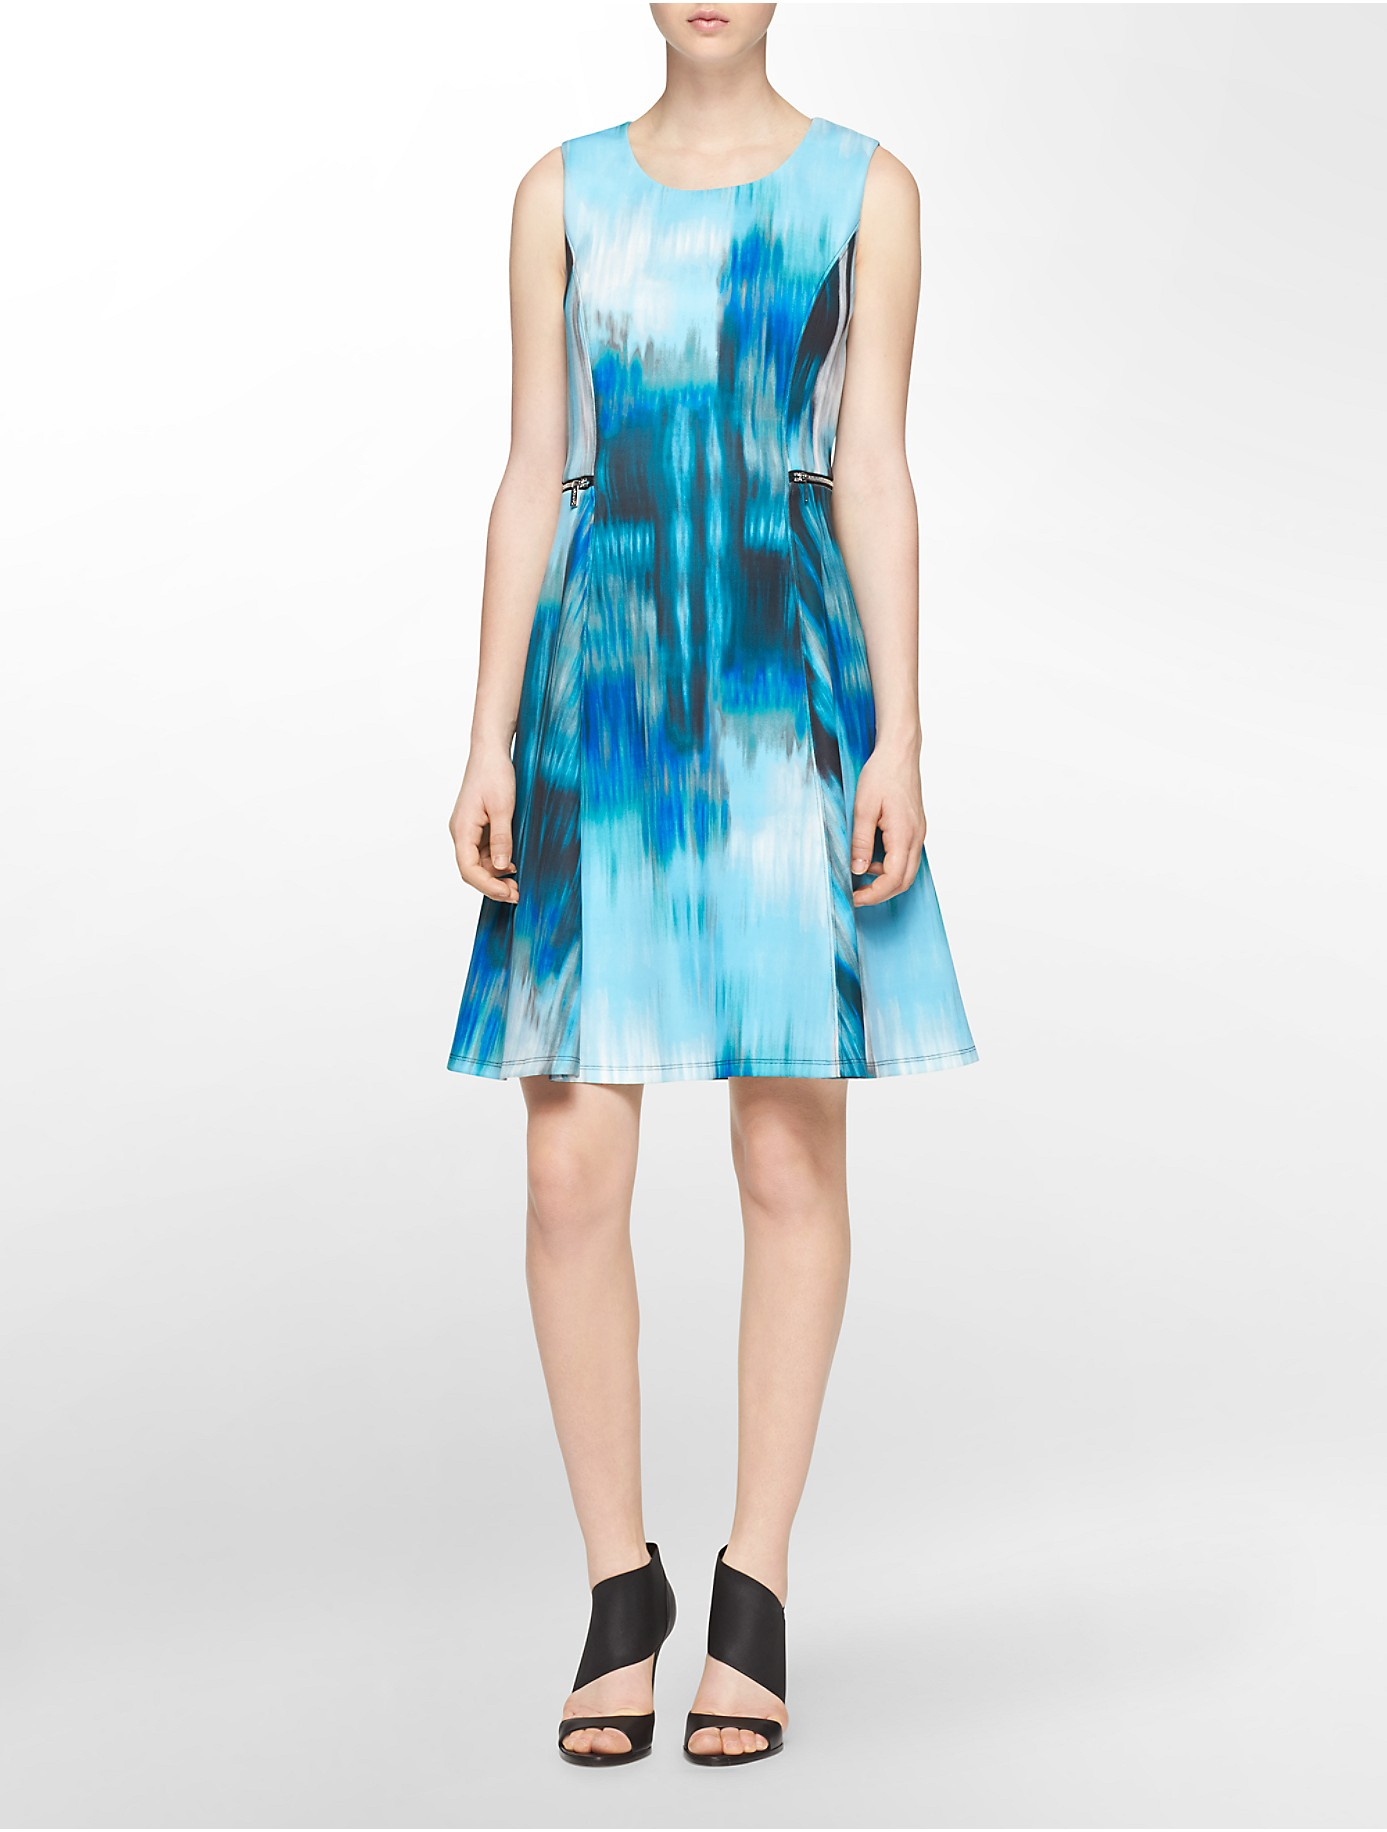 Lyst - Calvin Klein White Label Watercolor Neoprene Sleeveless Fit ...